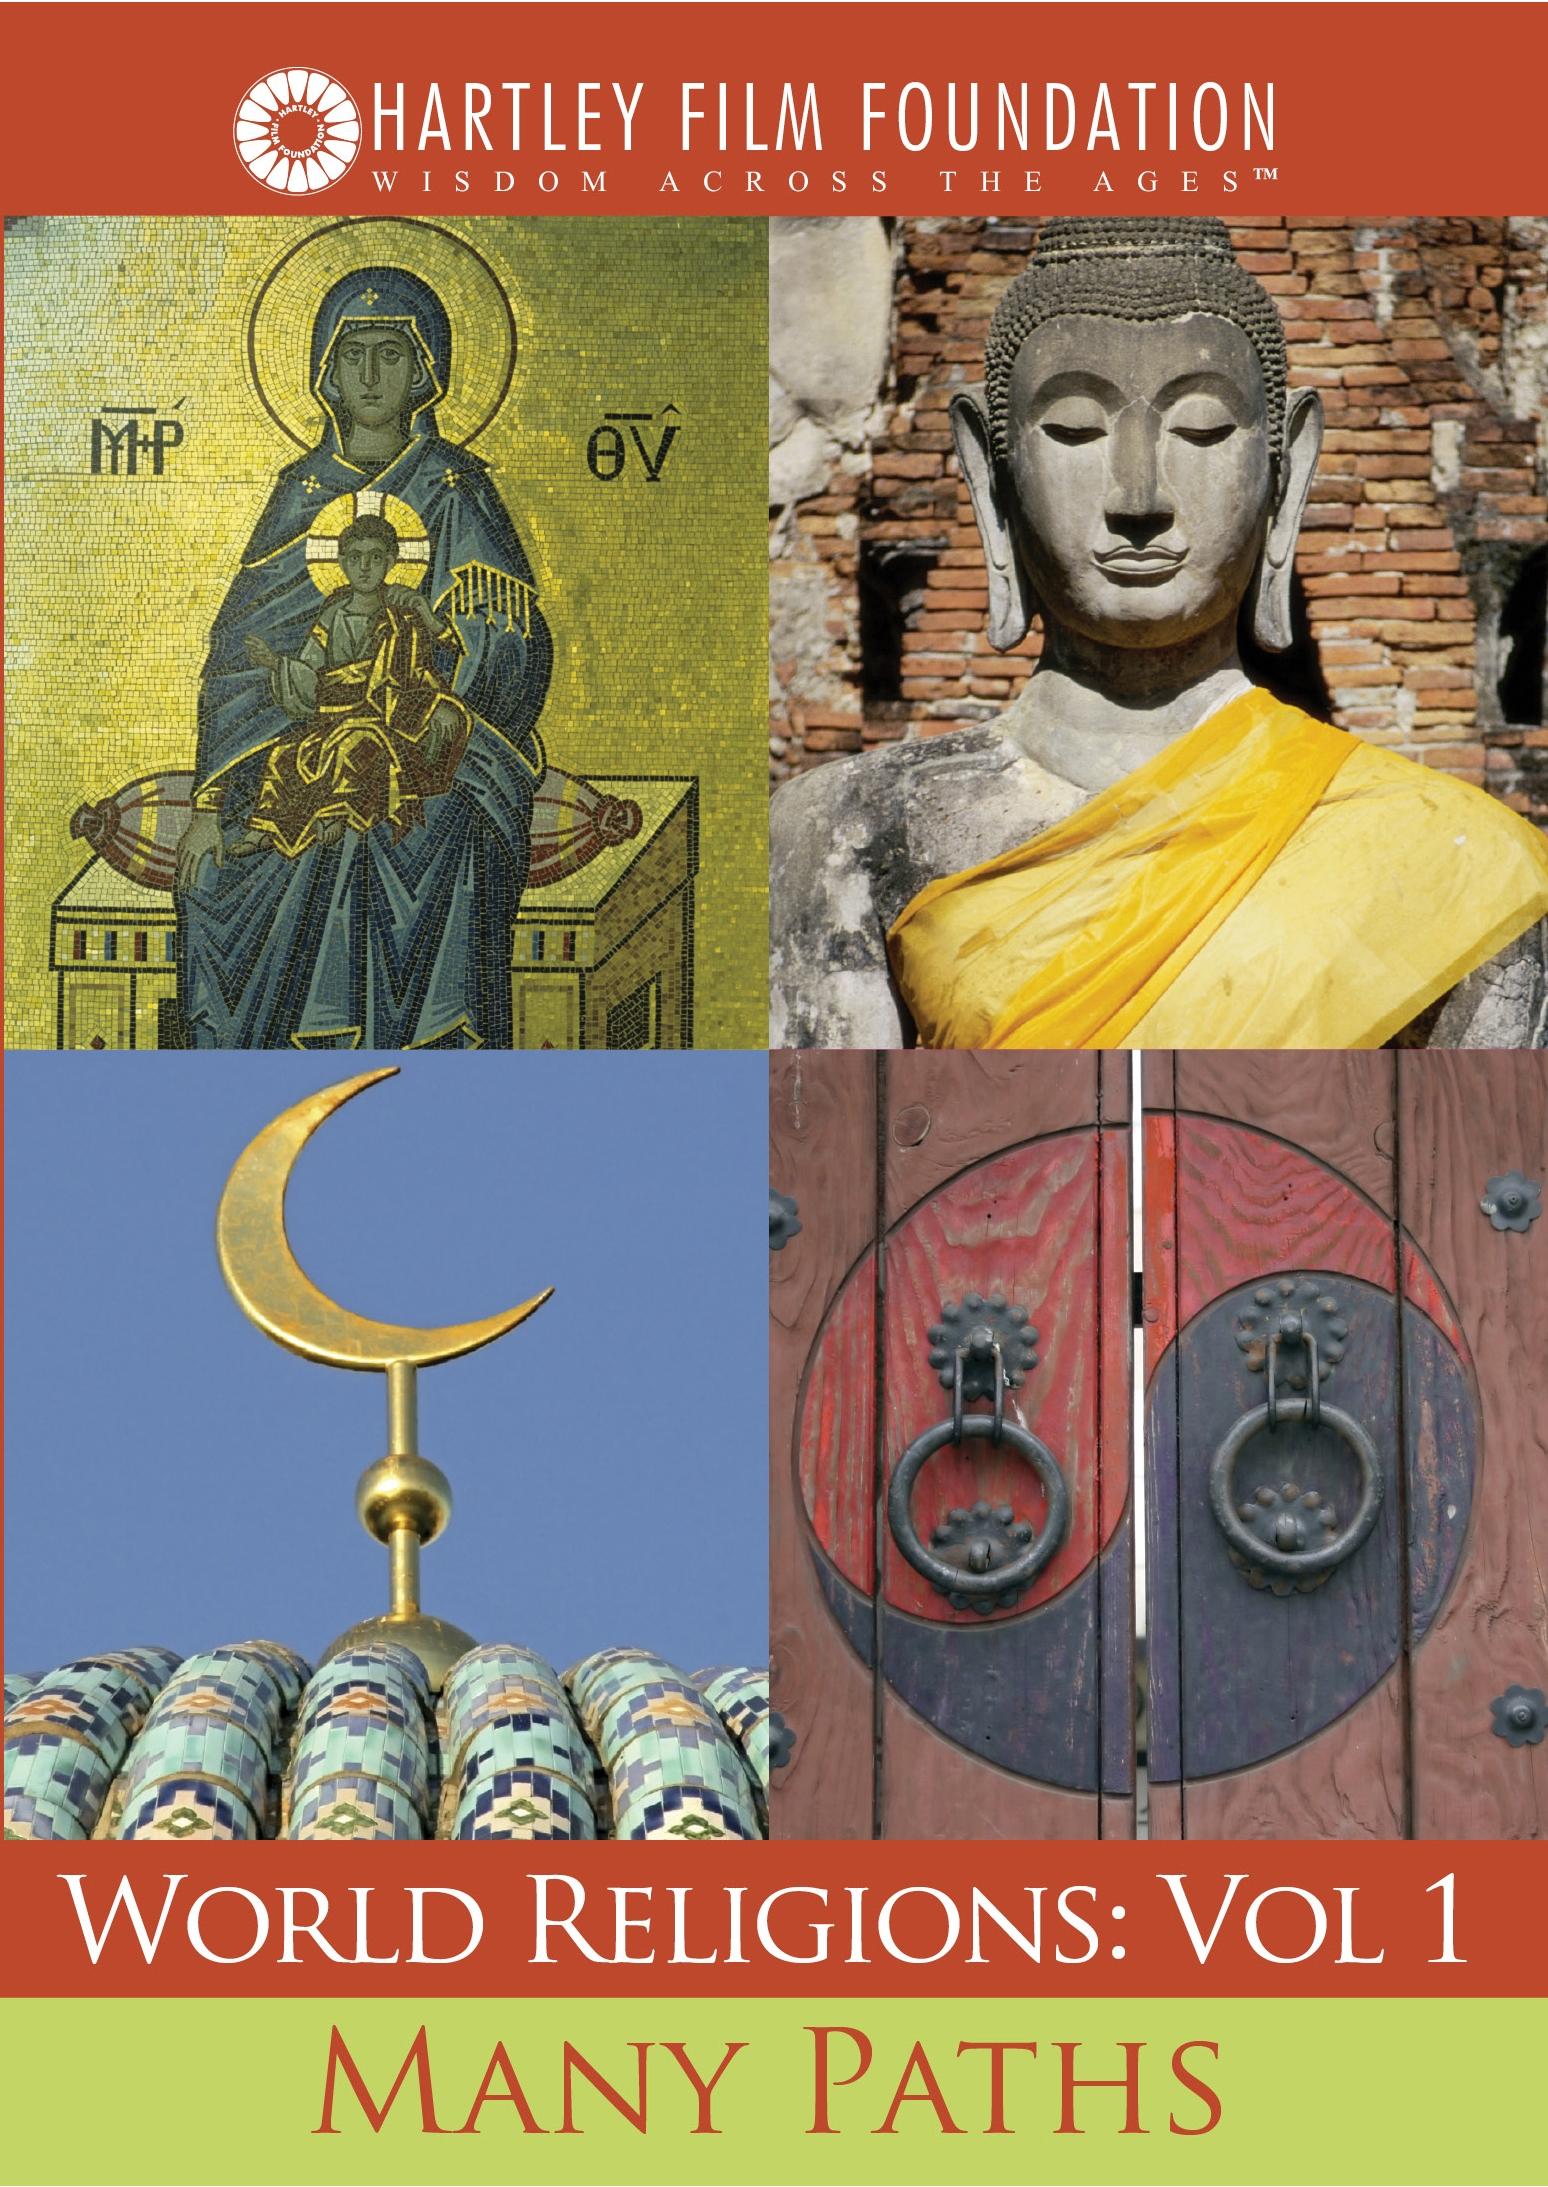 Religions1a.jpg